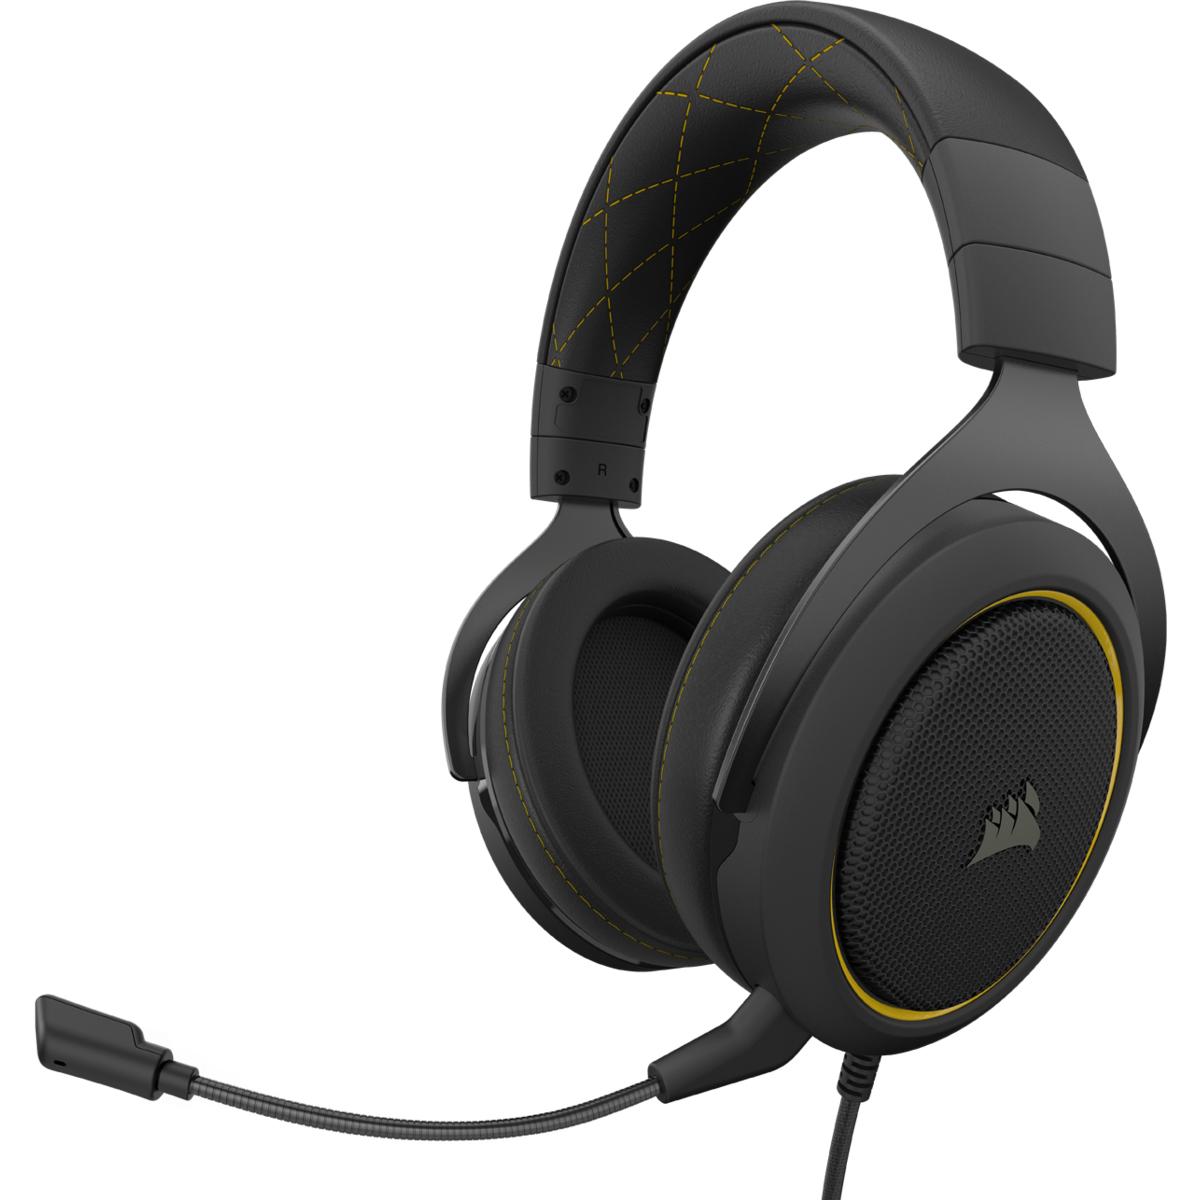 Hs60 Pro Surround Headset Yellow